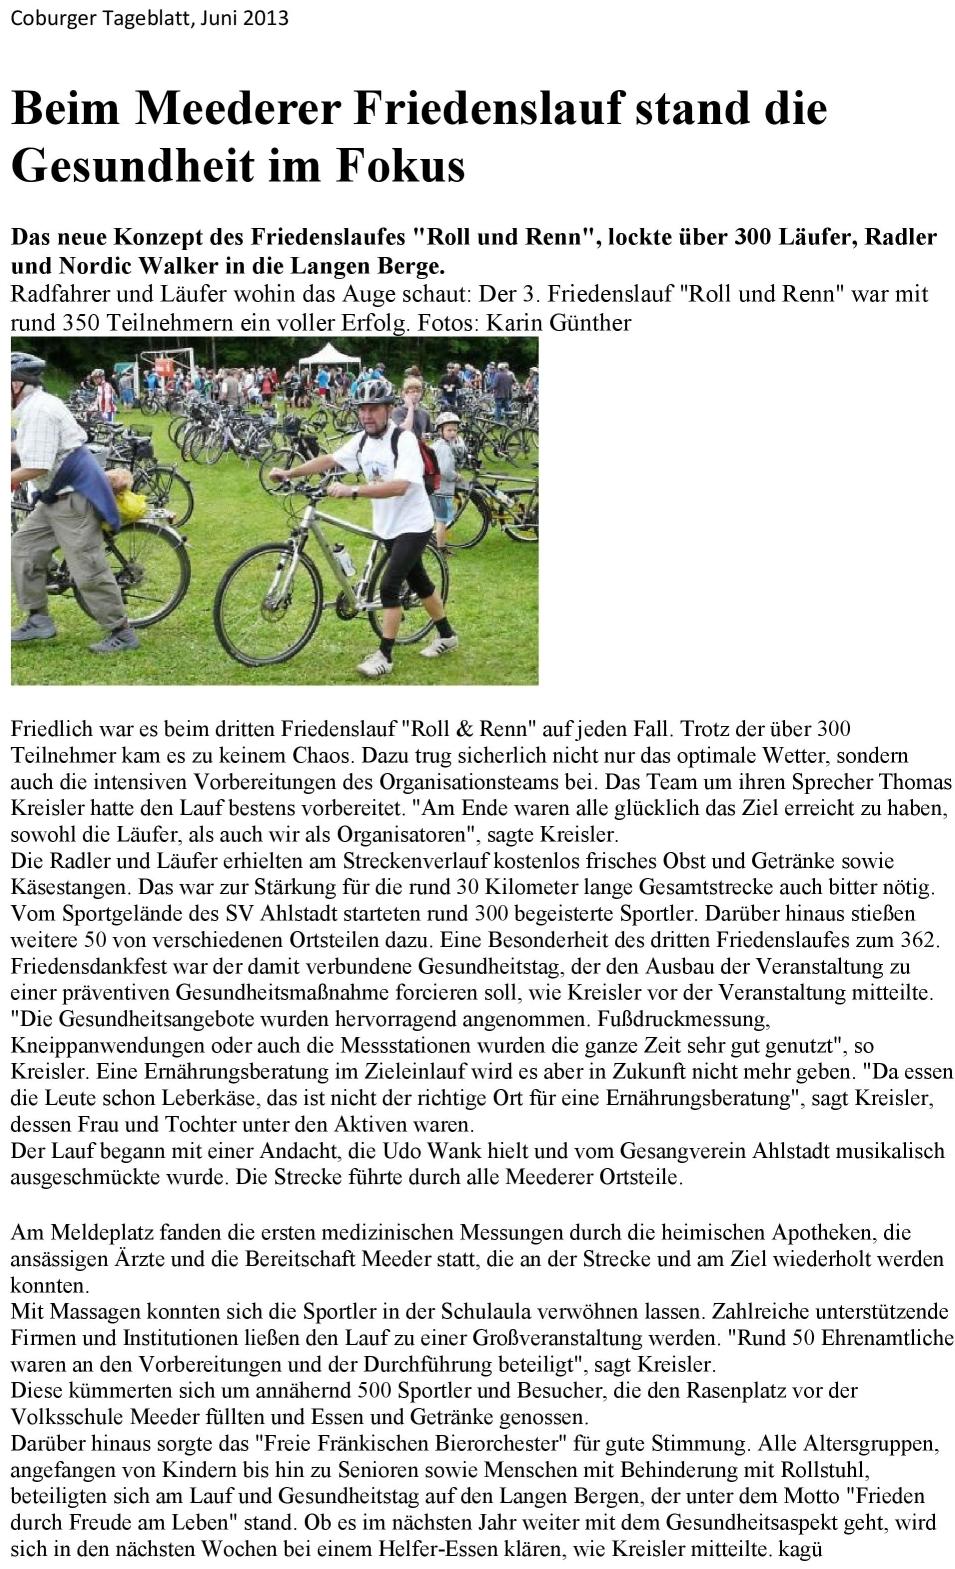 Presse_Cobuger_Tageblatt